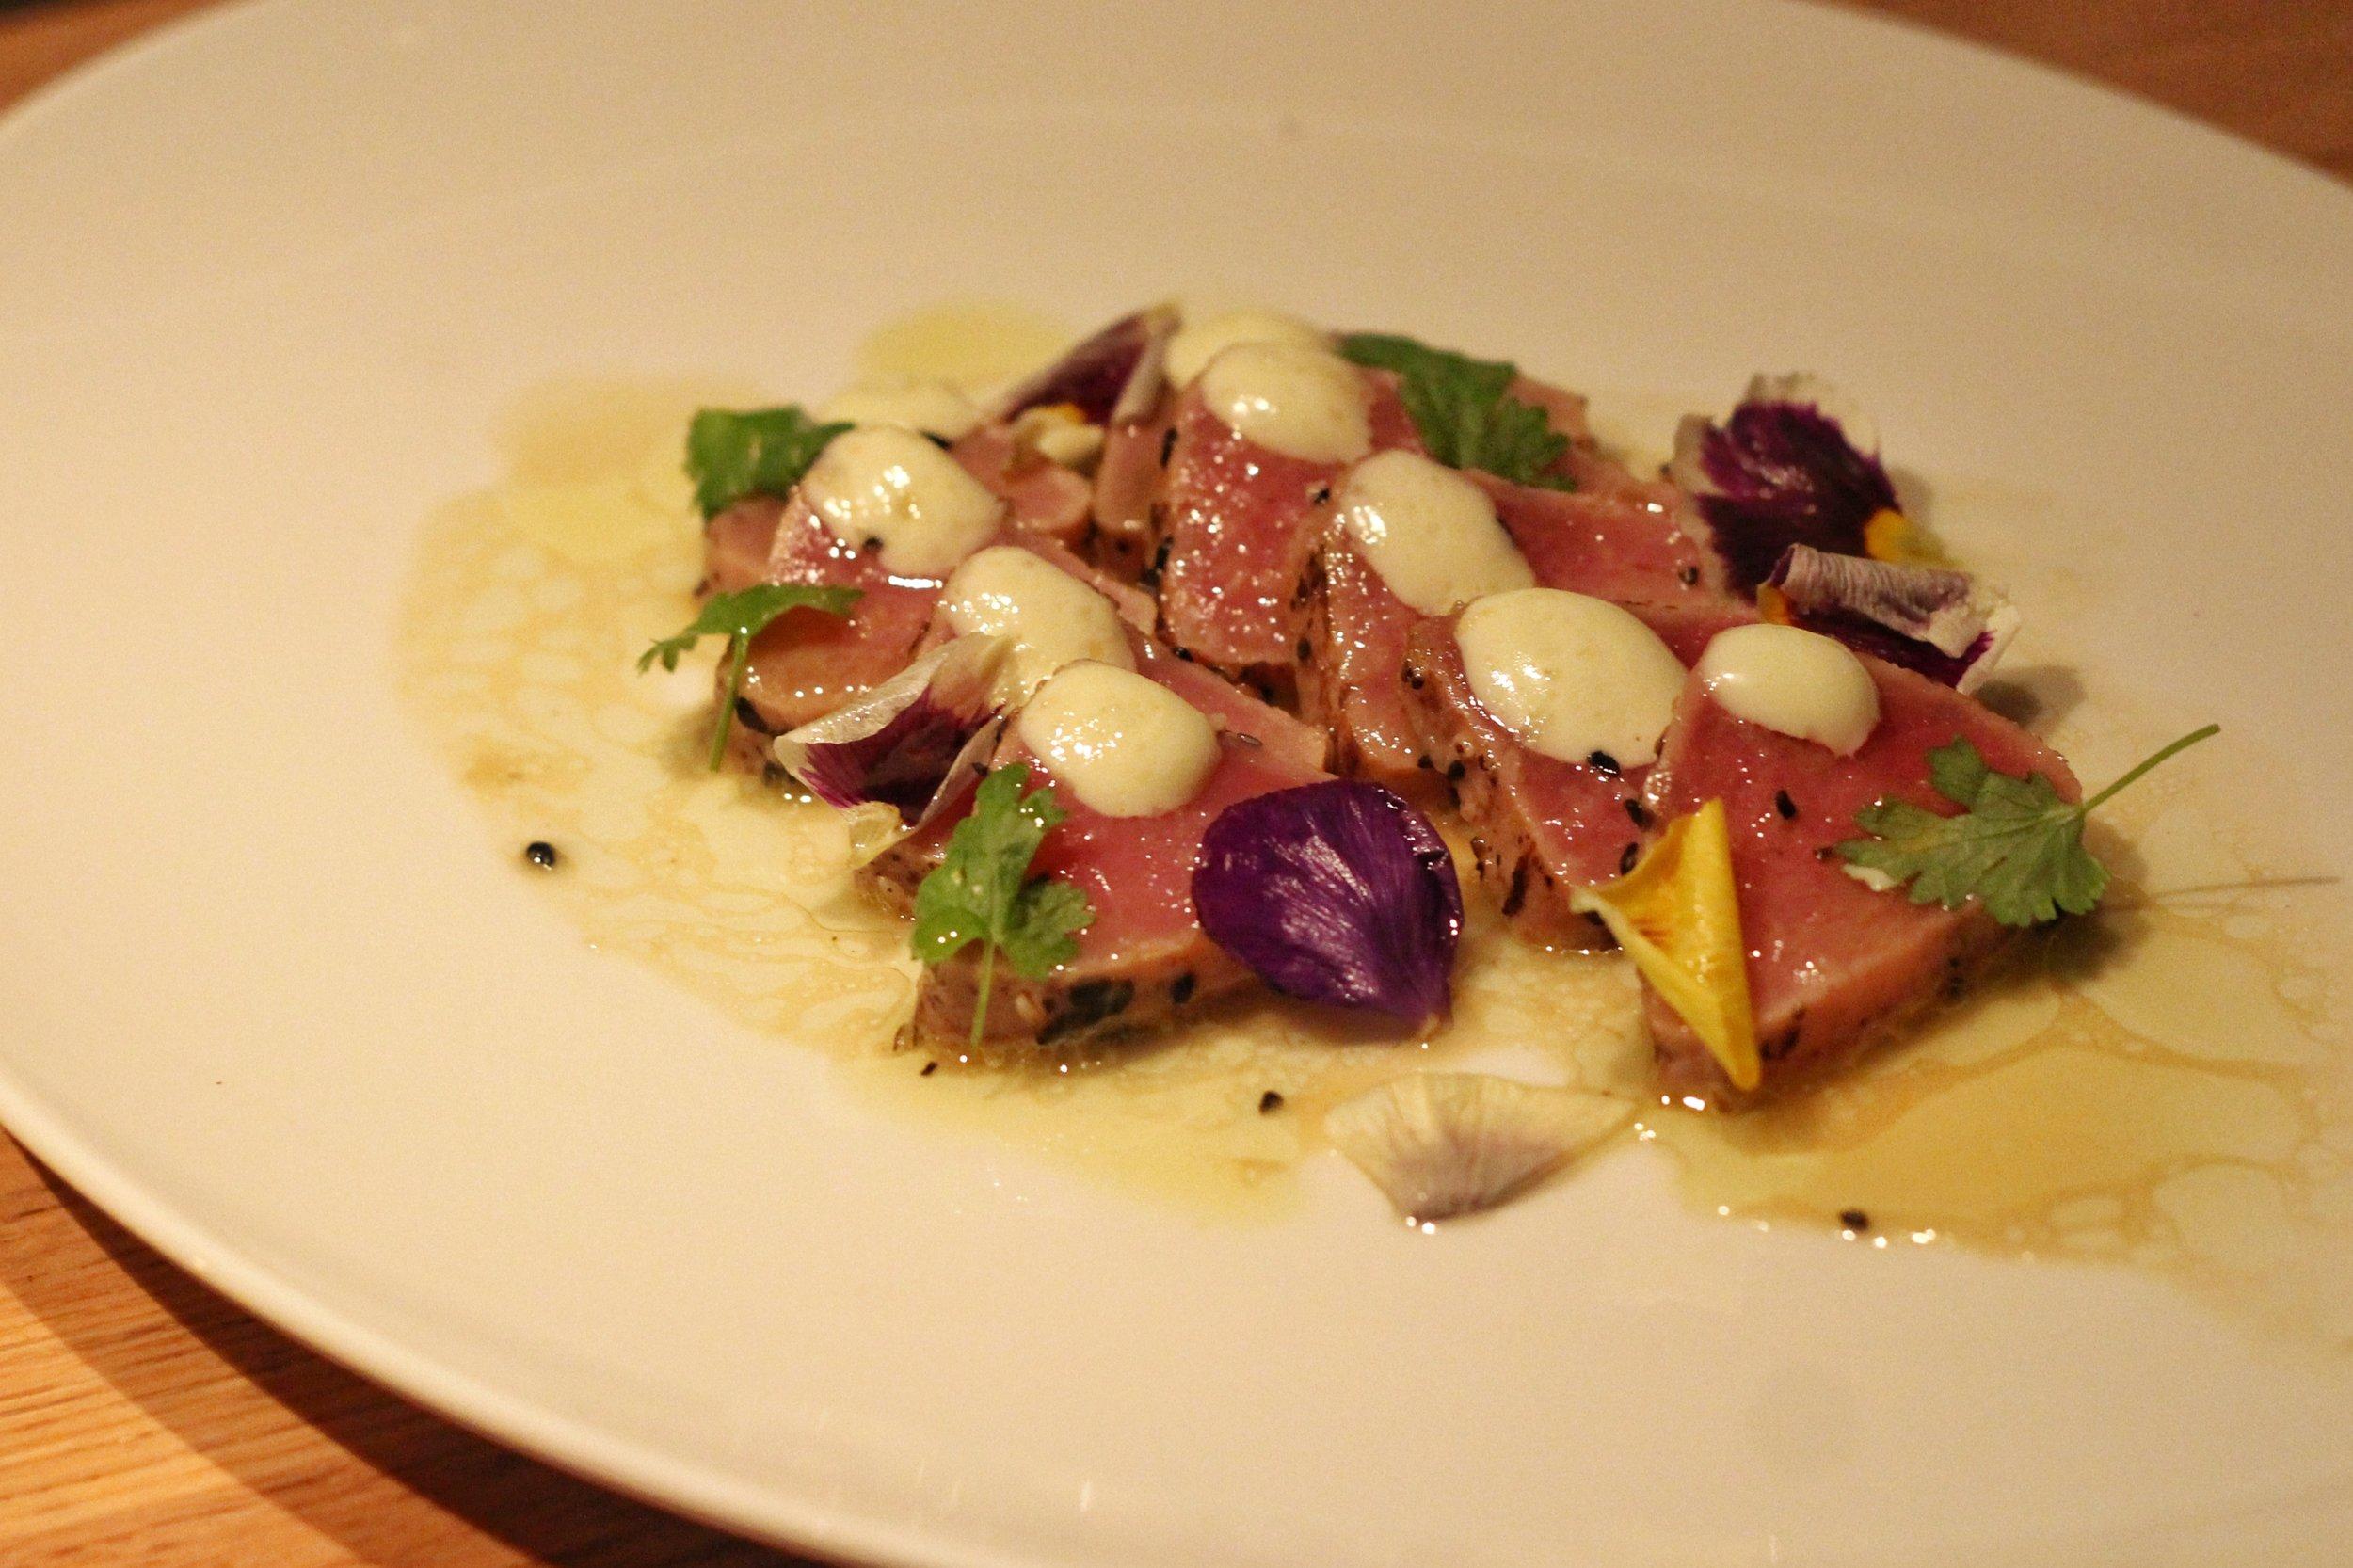 Seared Ahi Tuna Sashimi  - wasabi aioli, cilantro, yuzu soy vinaigrette